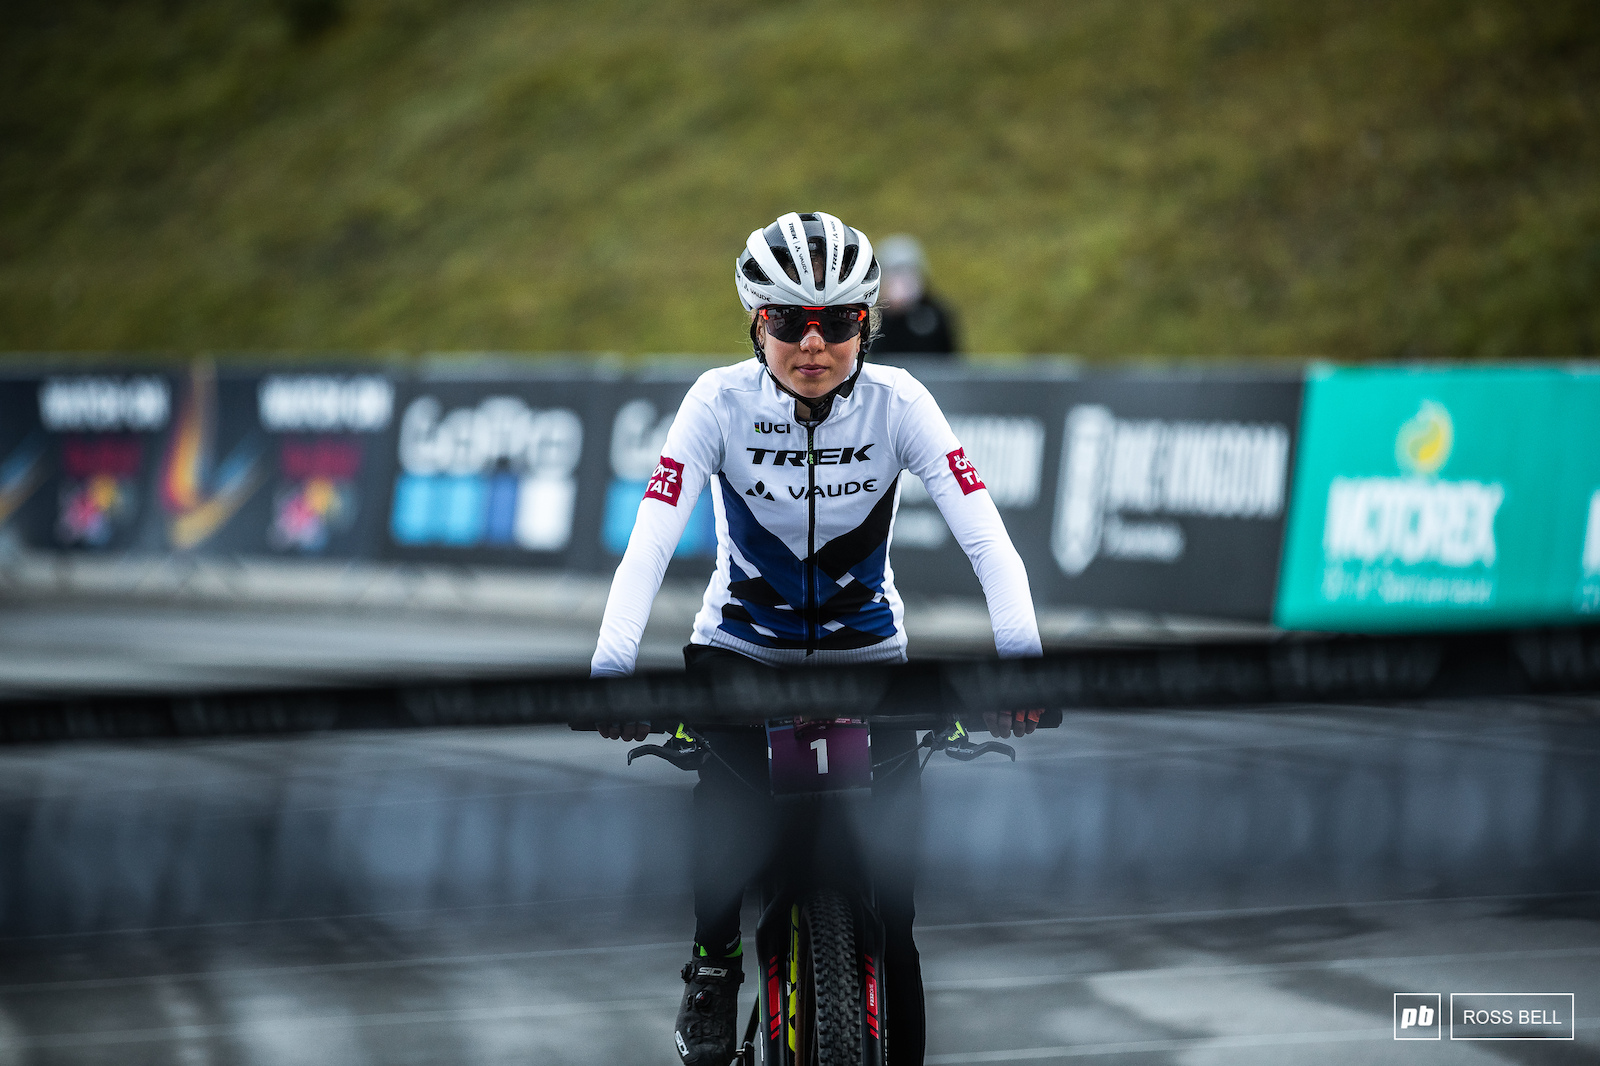 Mona Mitterwallner rolls up to the start line.